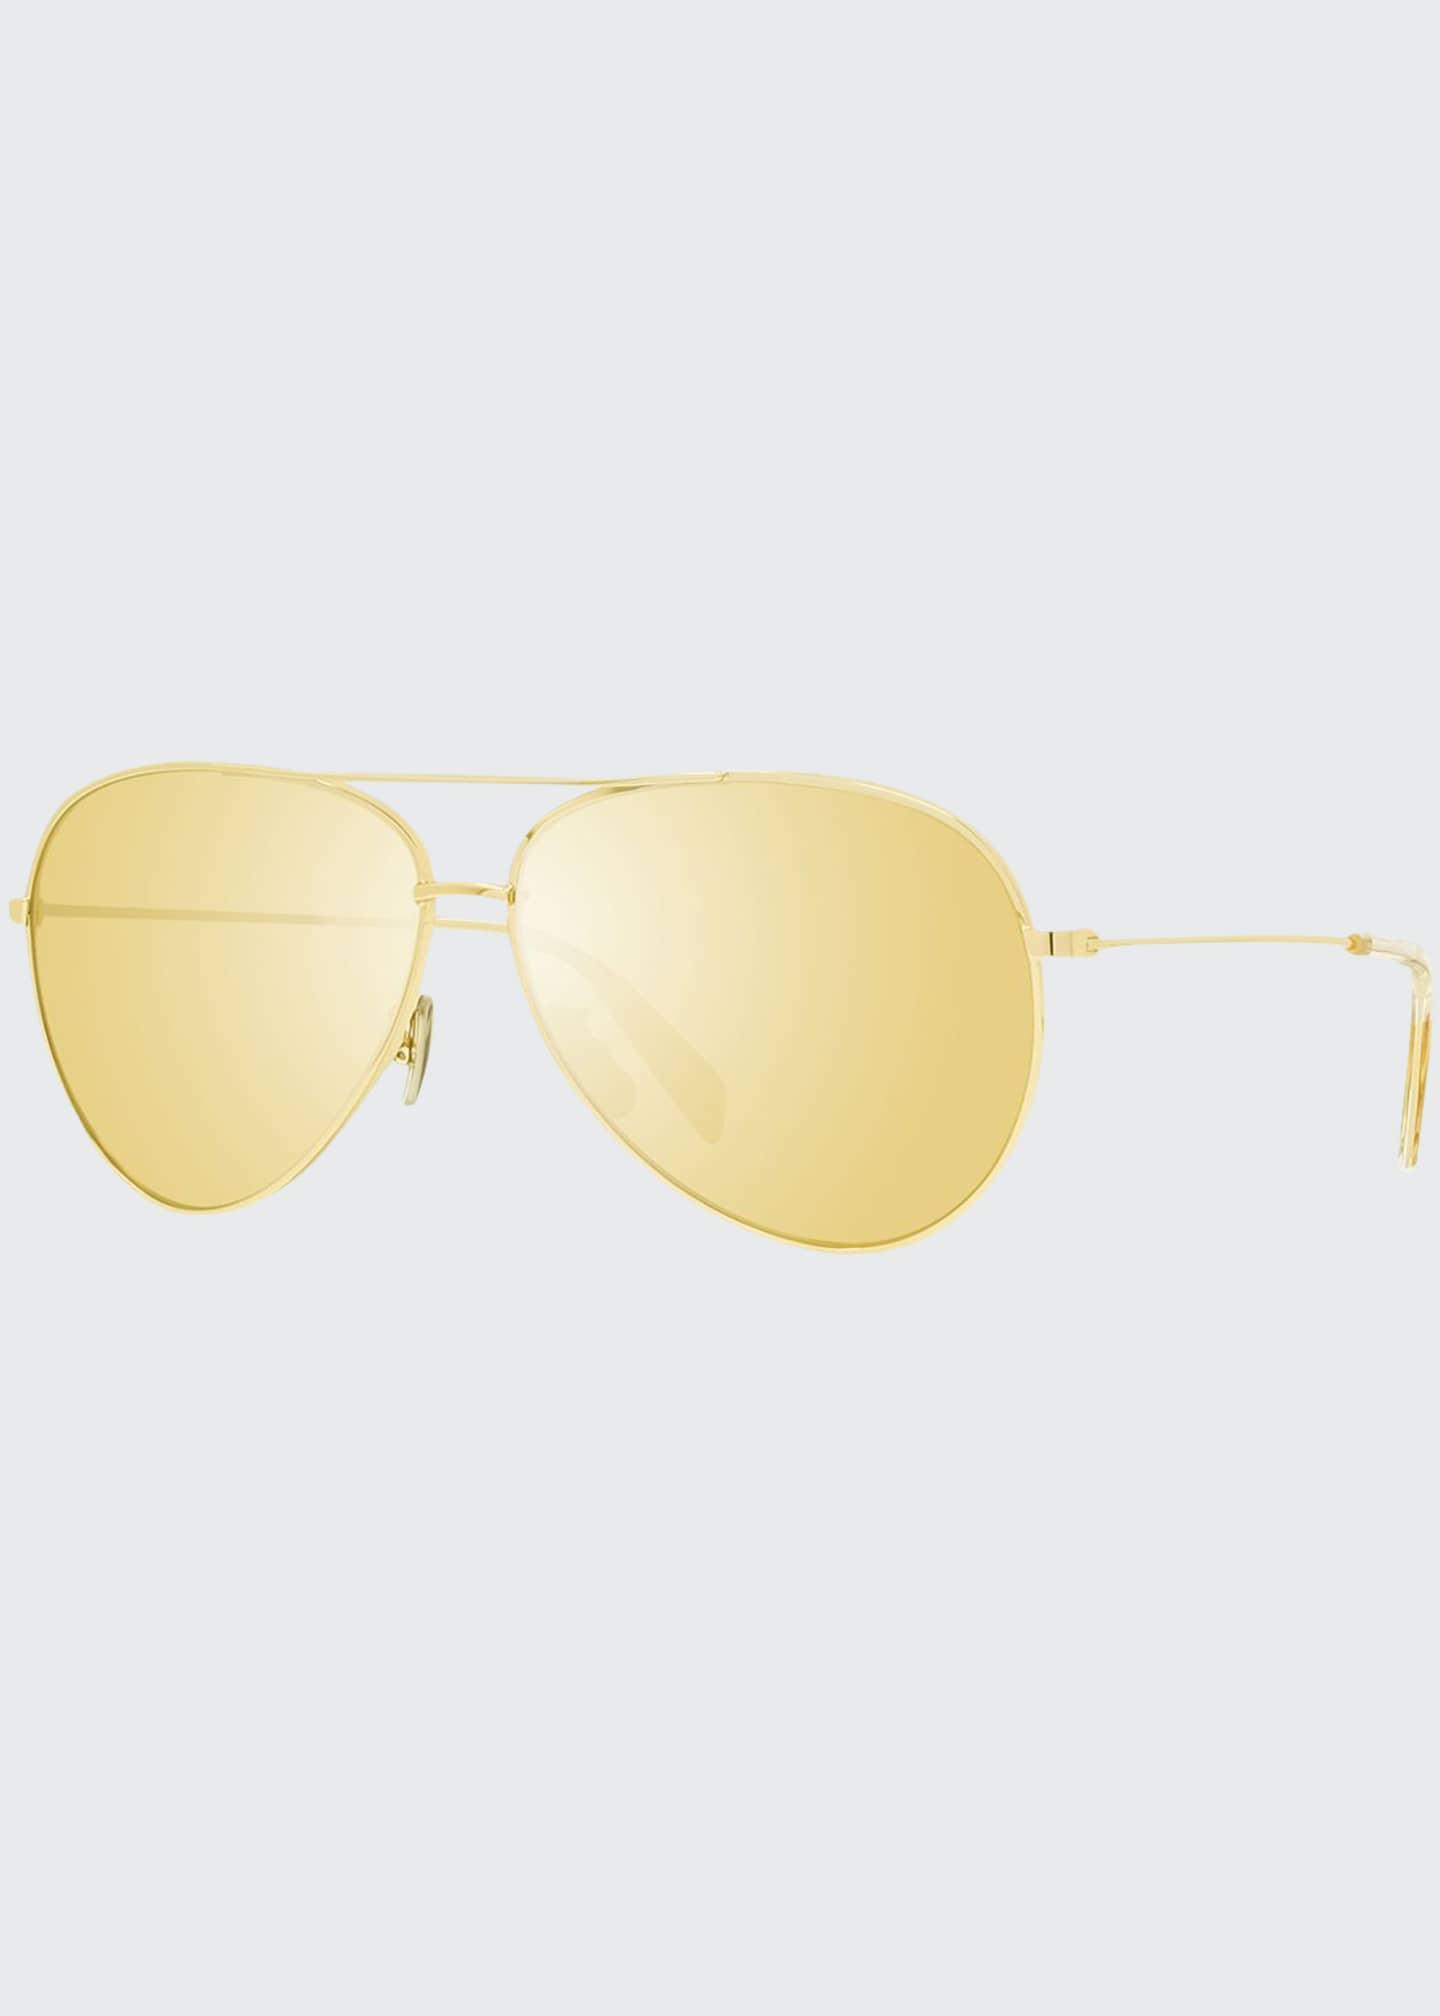 Celine Avant Premiere Mirrored Aviator Sunglasses